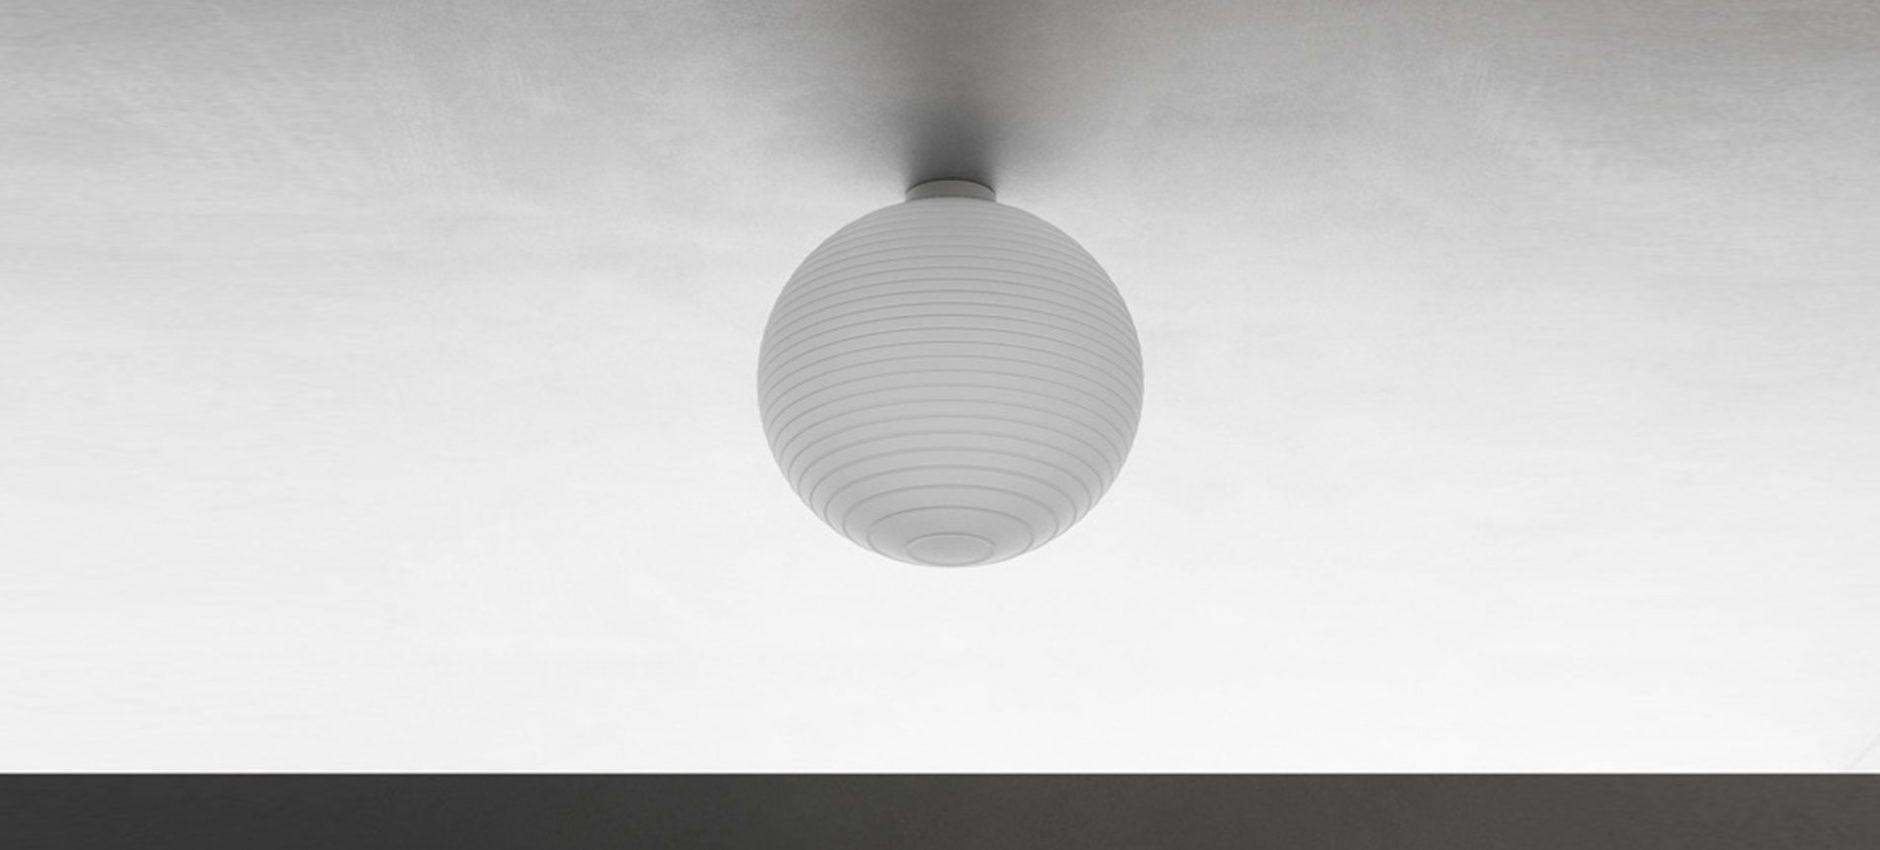 cdl-luce-illuminazione-vendita-lampade-da-soffitto-1.jpg